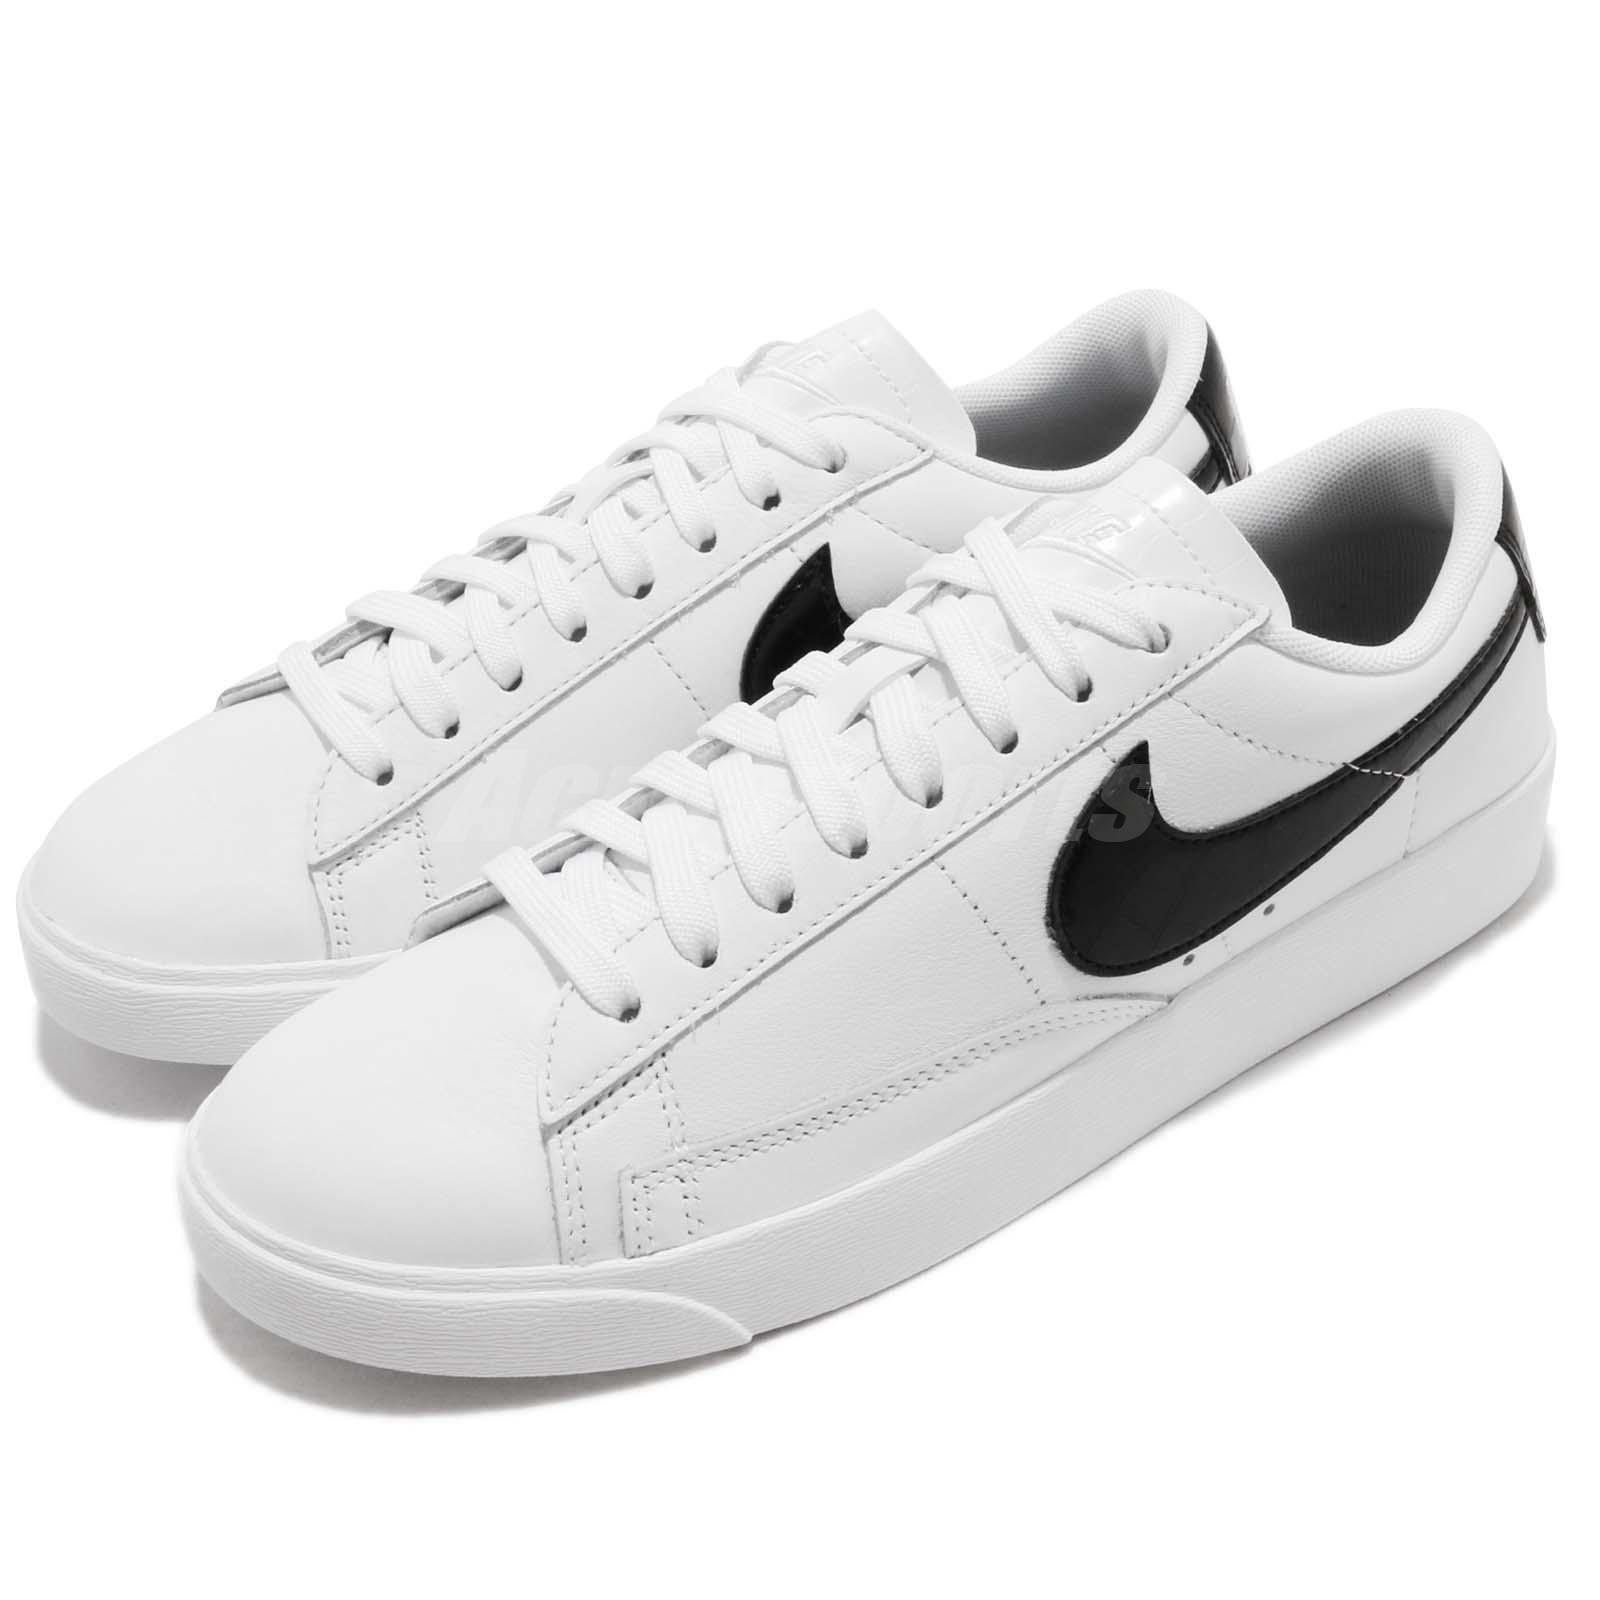 Nike Bajo Mujeres Blazer Bajo Nike Blanco Negro Para mujeres Zapatos Tenis Estilo de vida informal BQ0033-100 1c5710